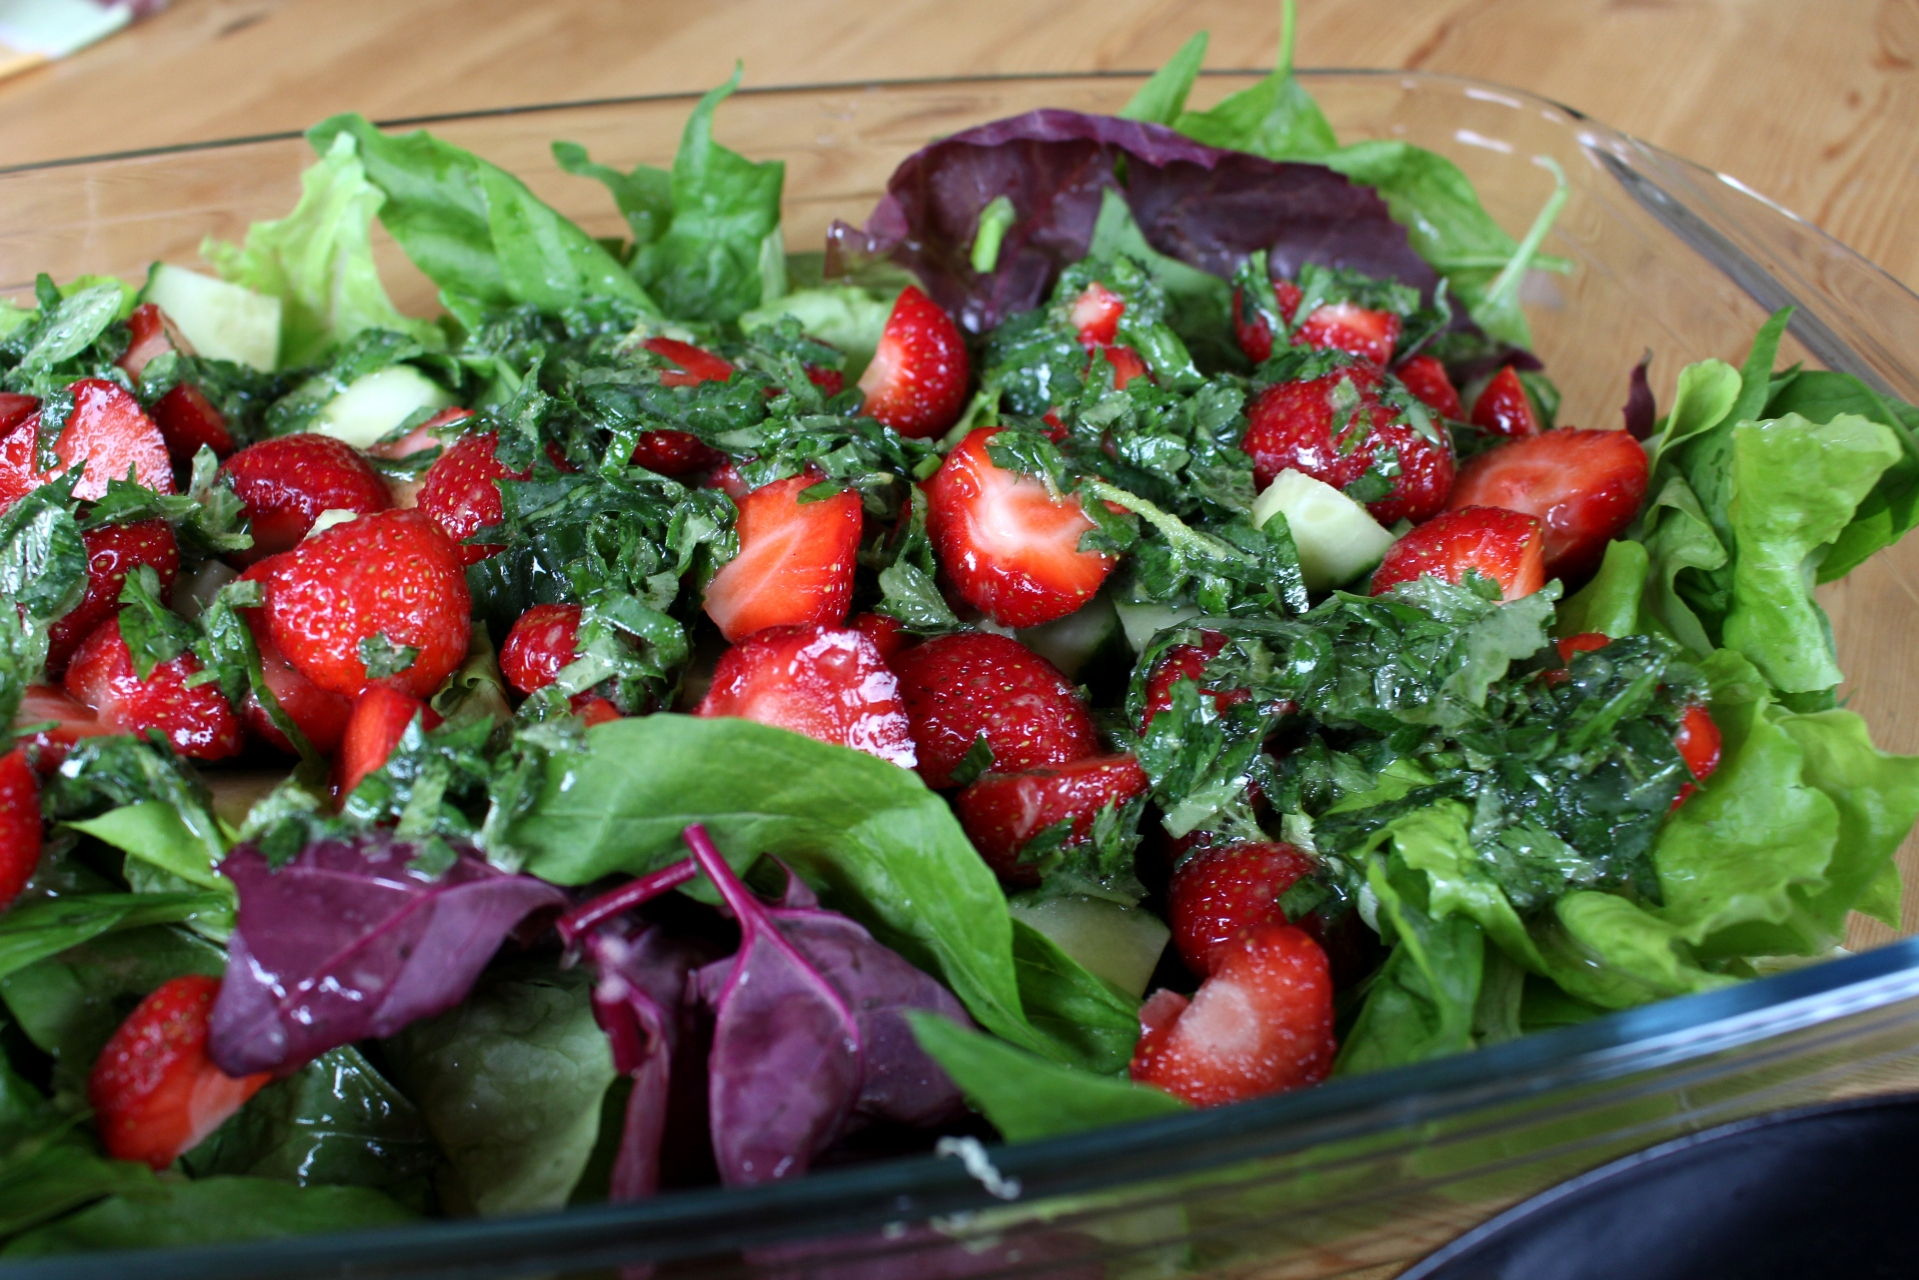 Erdbeer-Melisse-Babyspinat-Salat08